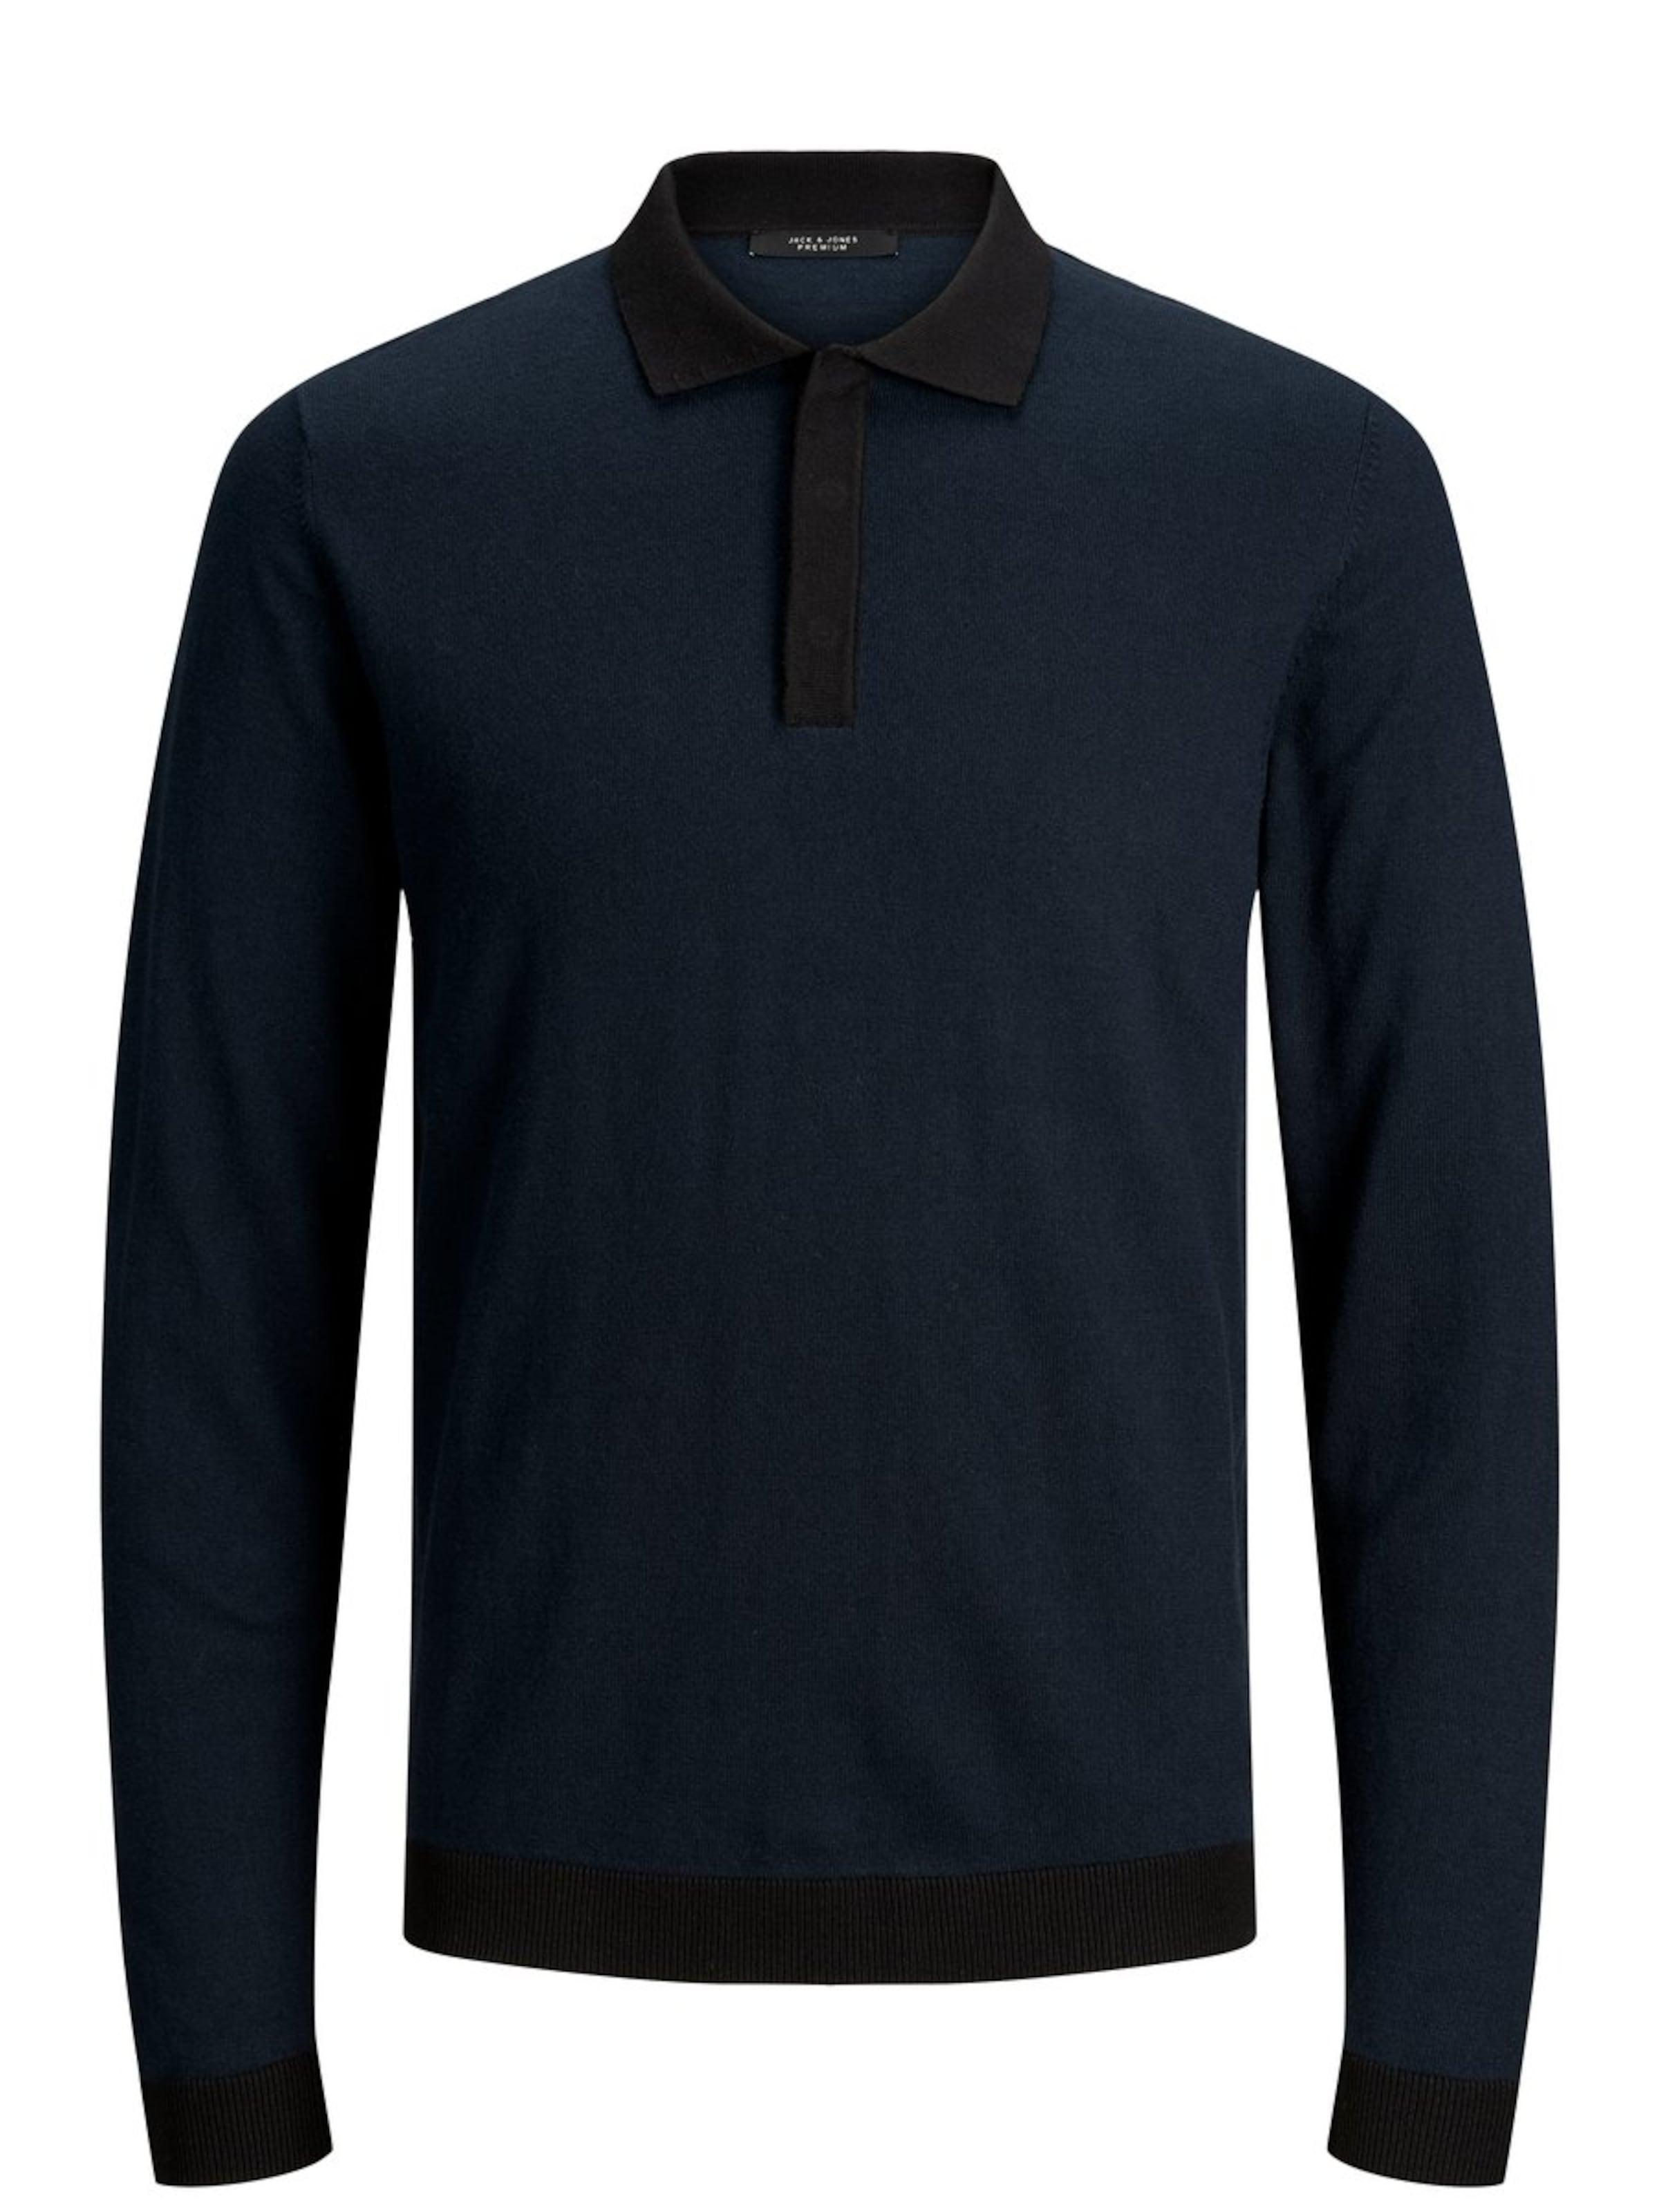 Nachtblau Poloshirt Jackamp; Jones Nachtblau Jones Poloshirt In Jones In Poloshirt In Jackamp; Jackamp; BoWedCxr